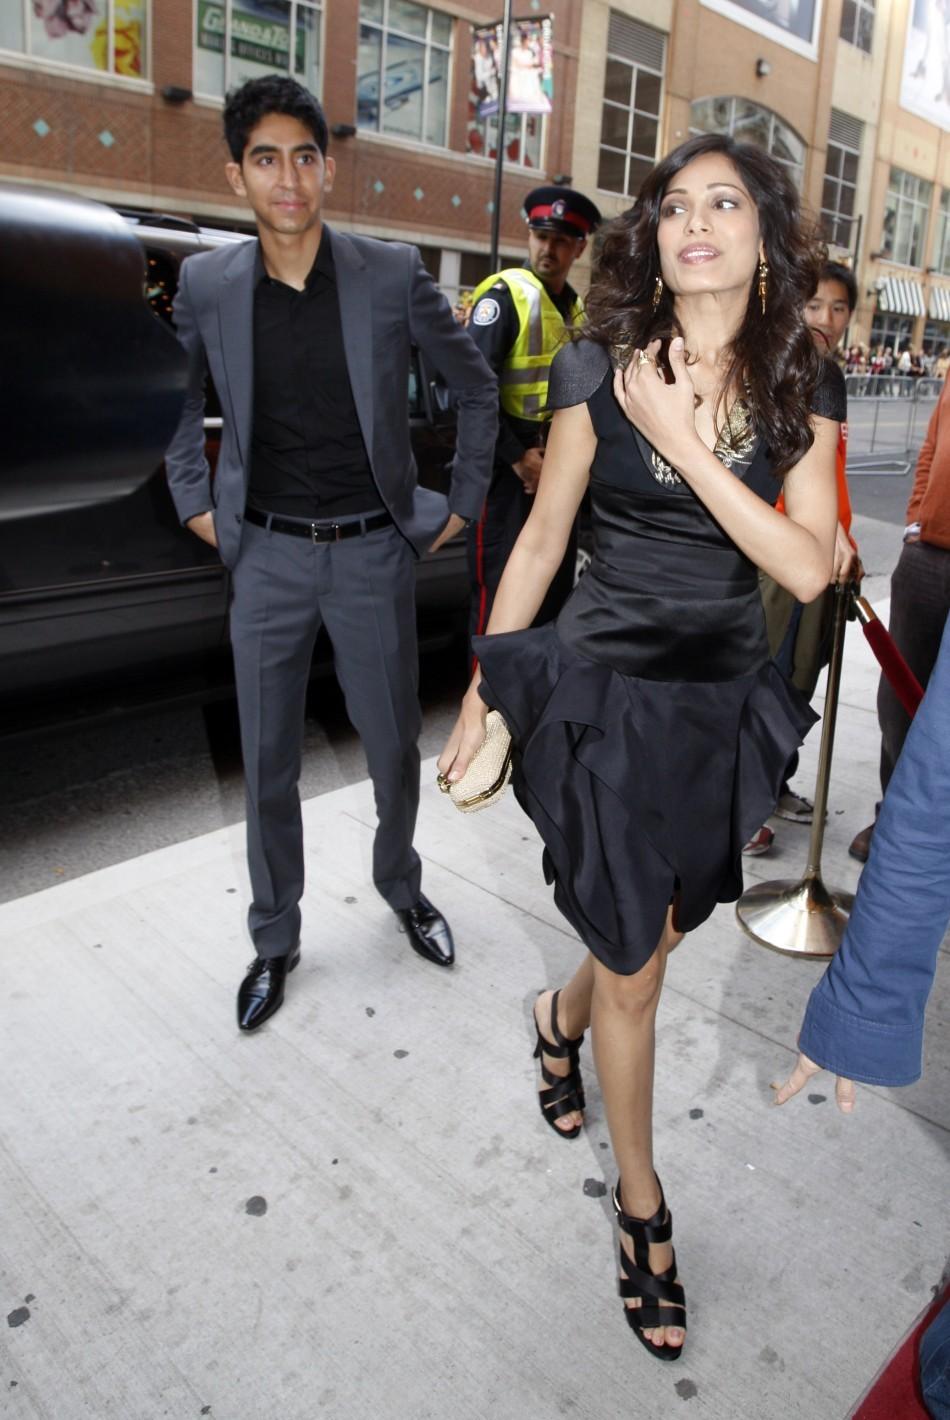 Freida Pinto and actor Dev Patel